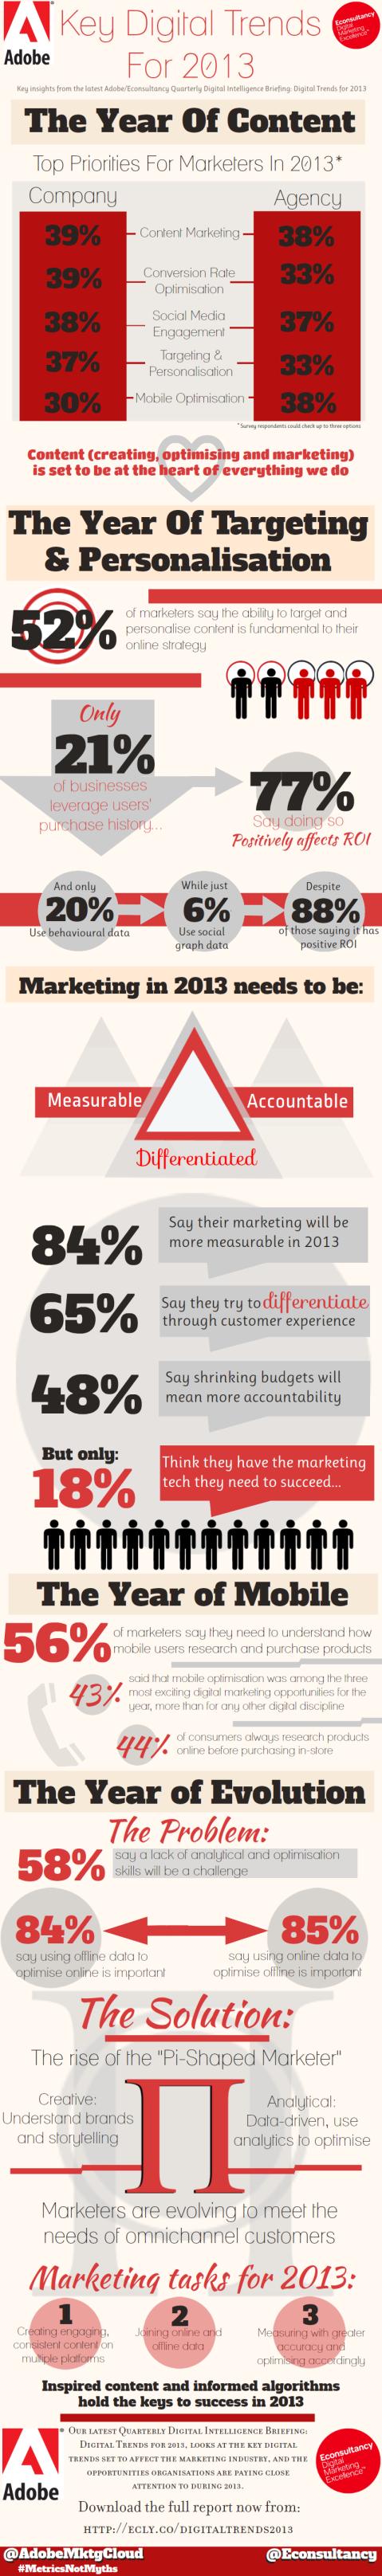 Key Digital Marketing Trends for 2013